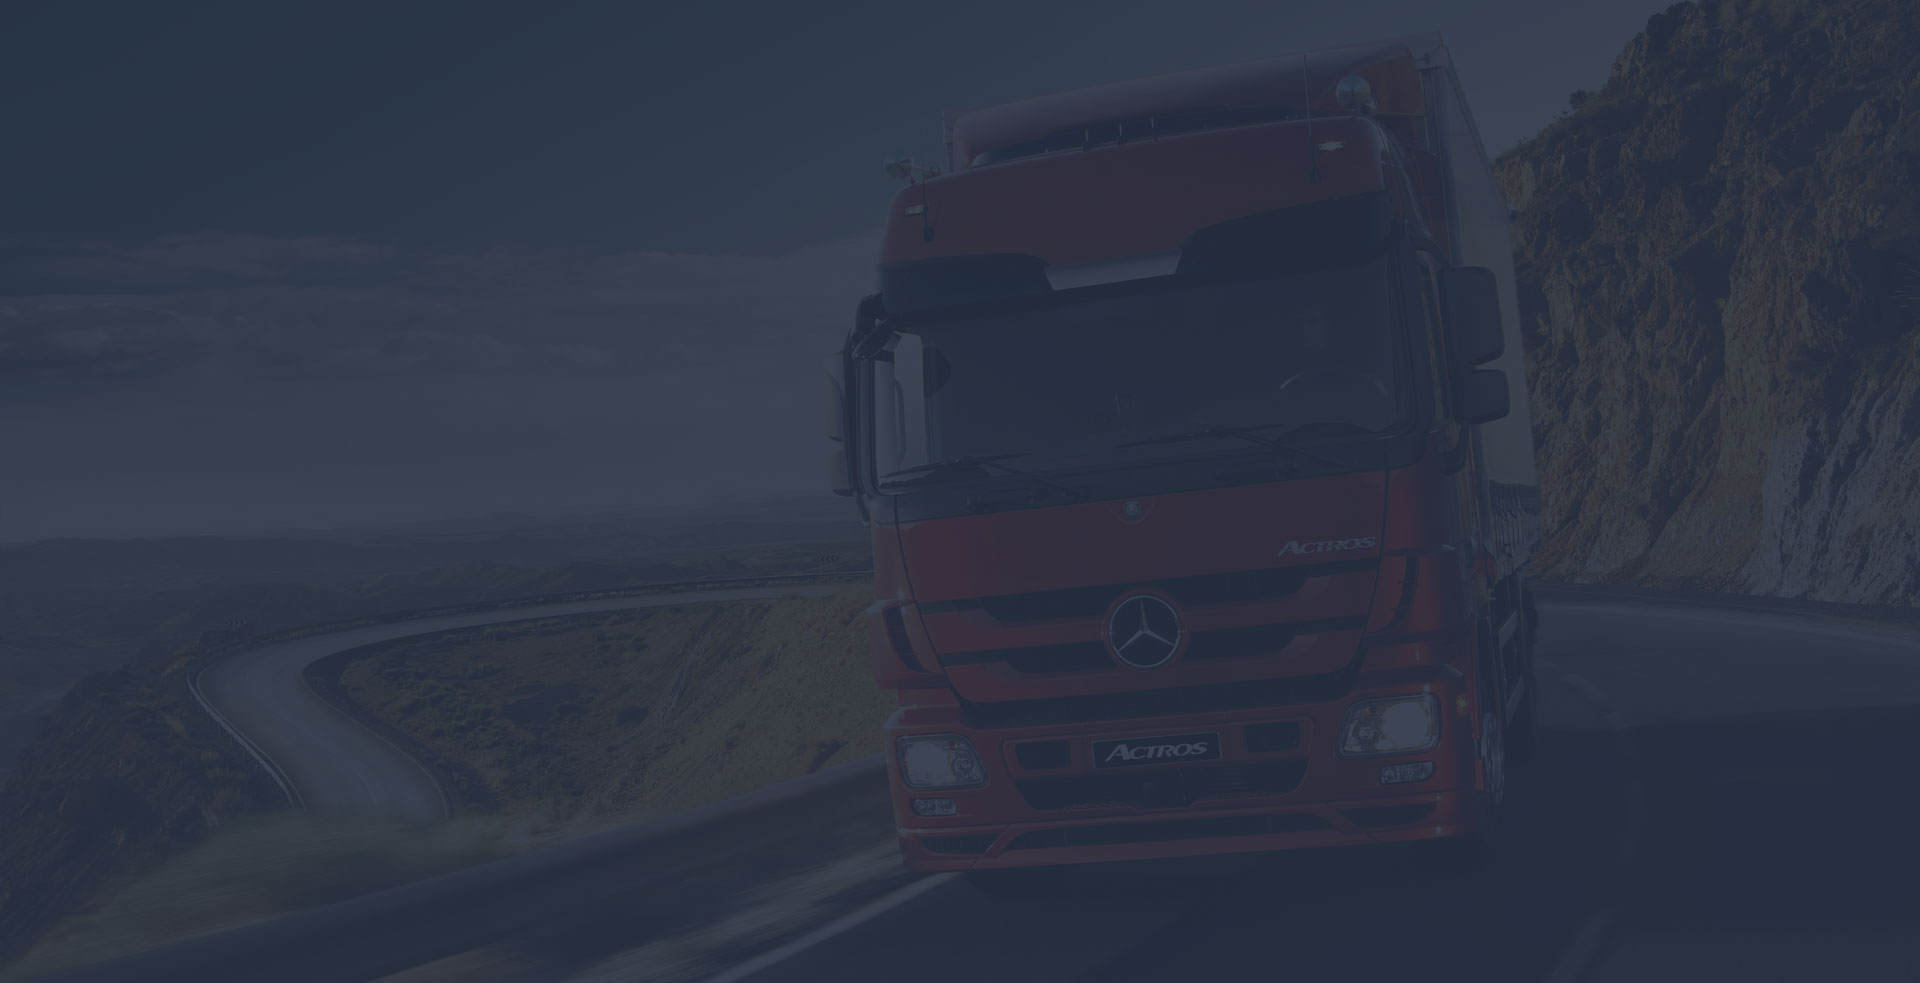 Autotrasporti-Terzi-banner4